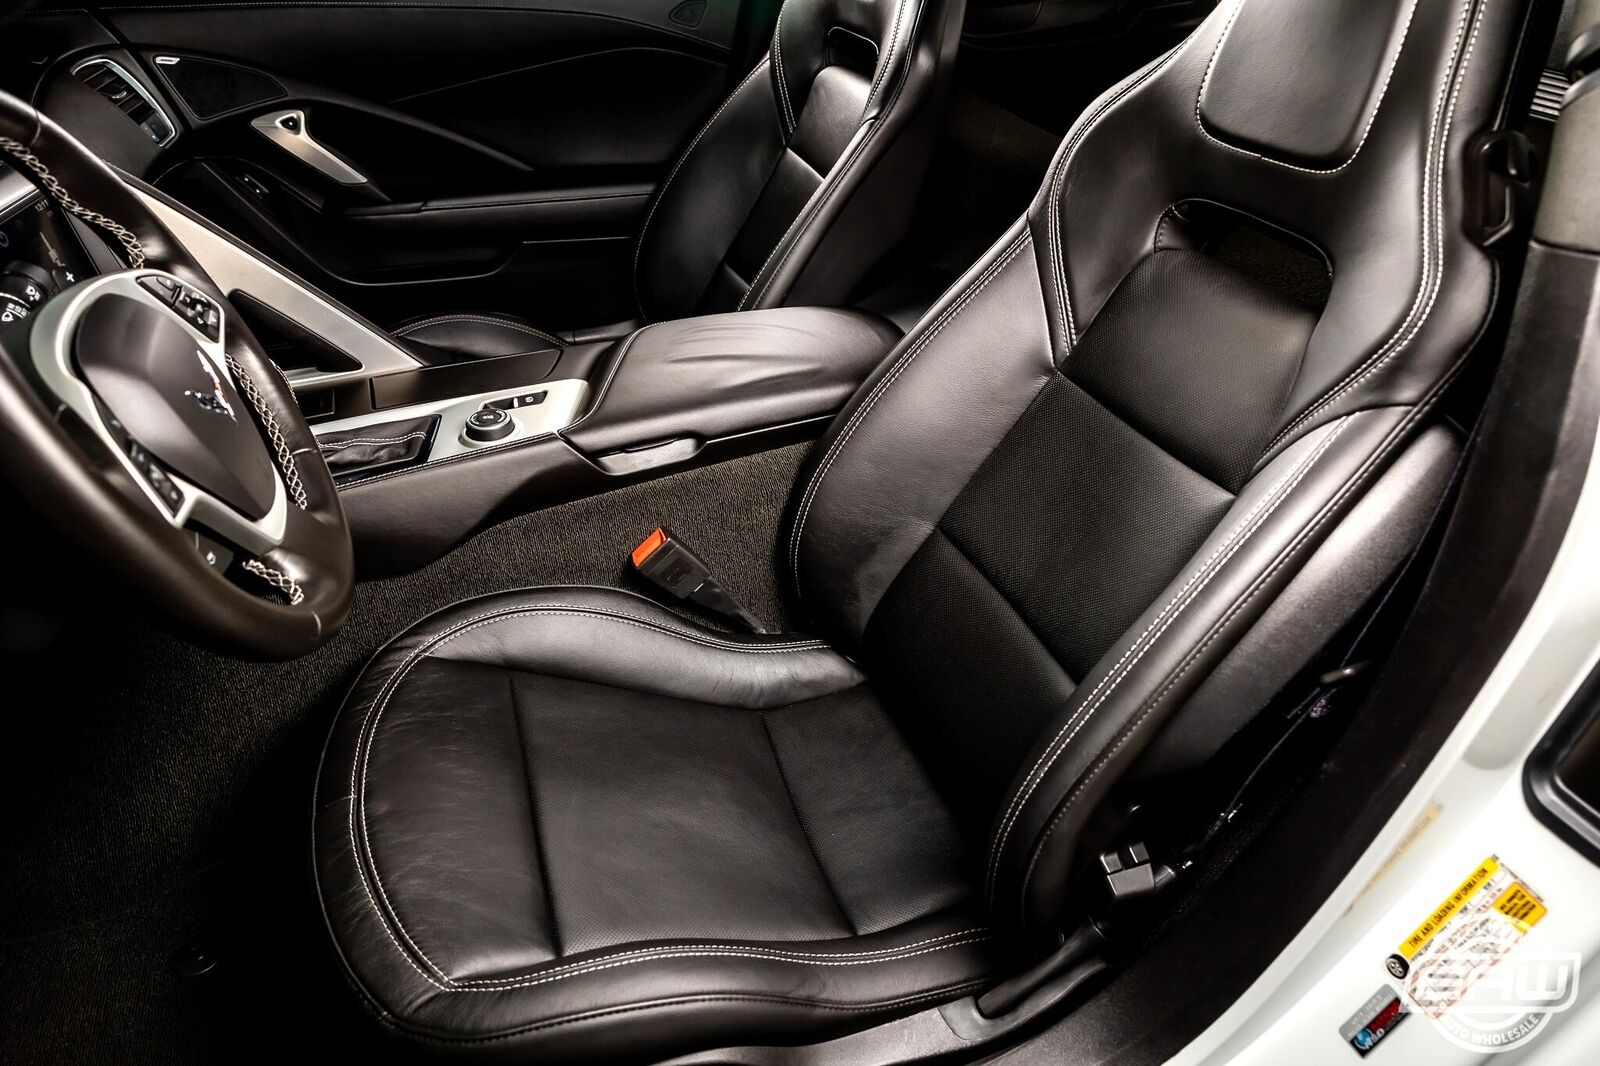 2014 White Chevrolet Corvette Coupe 1LT   C7 Corvette Photo 5